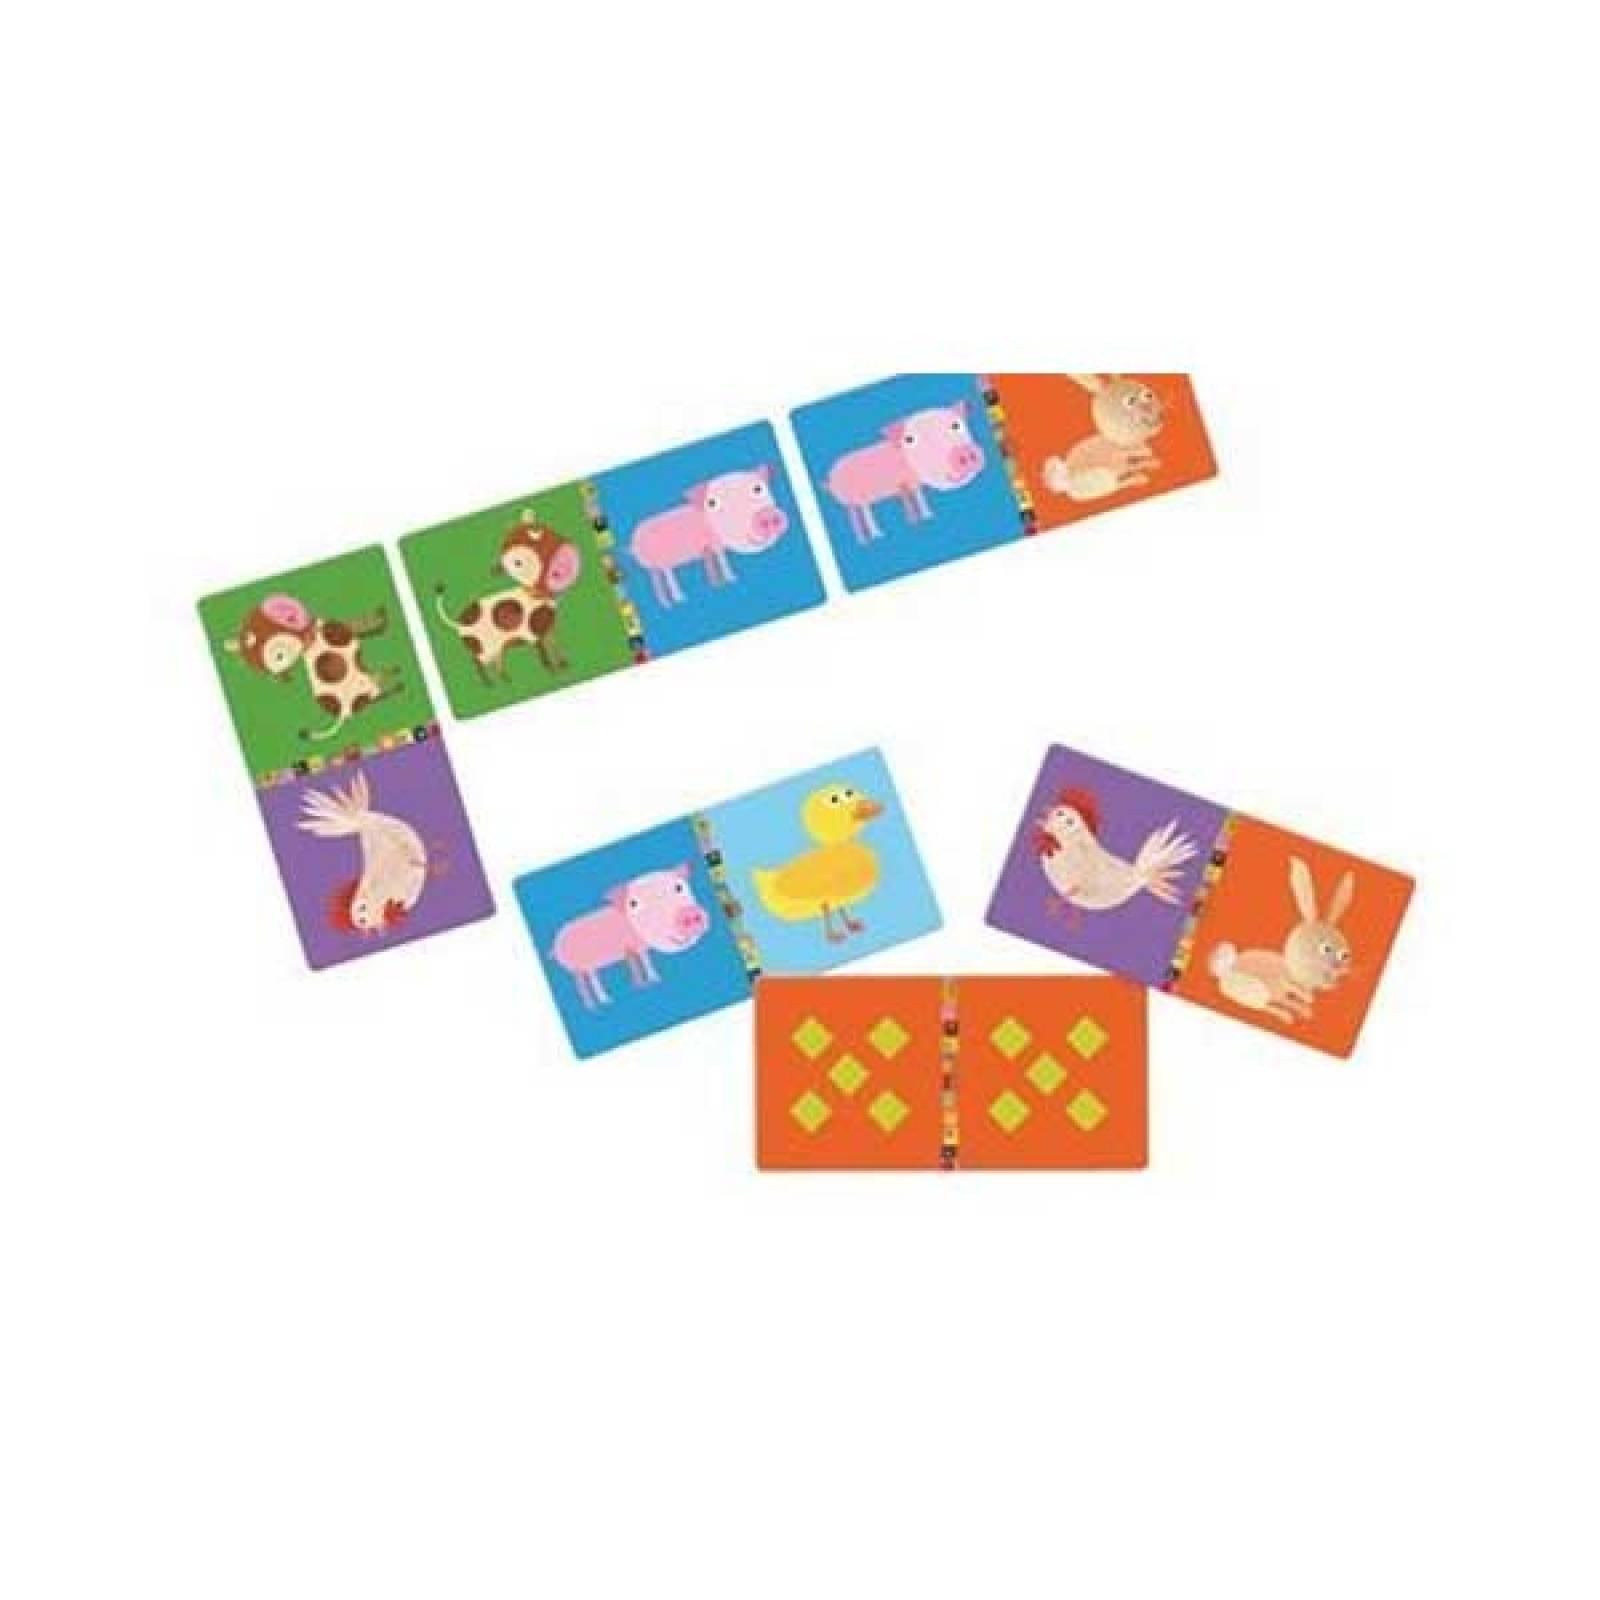 SPLIT Farm Animal Dominoes 28pc By Djeco Age 3yr+